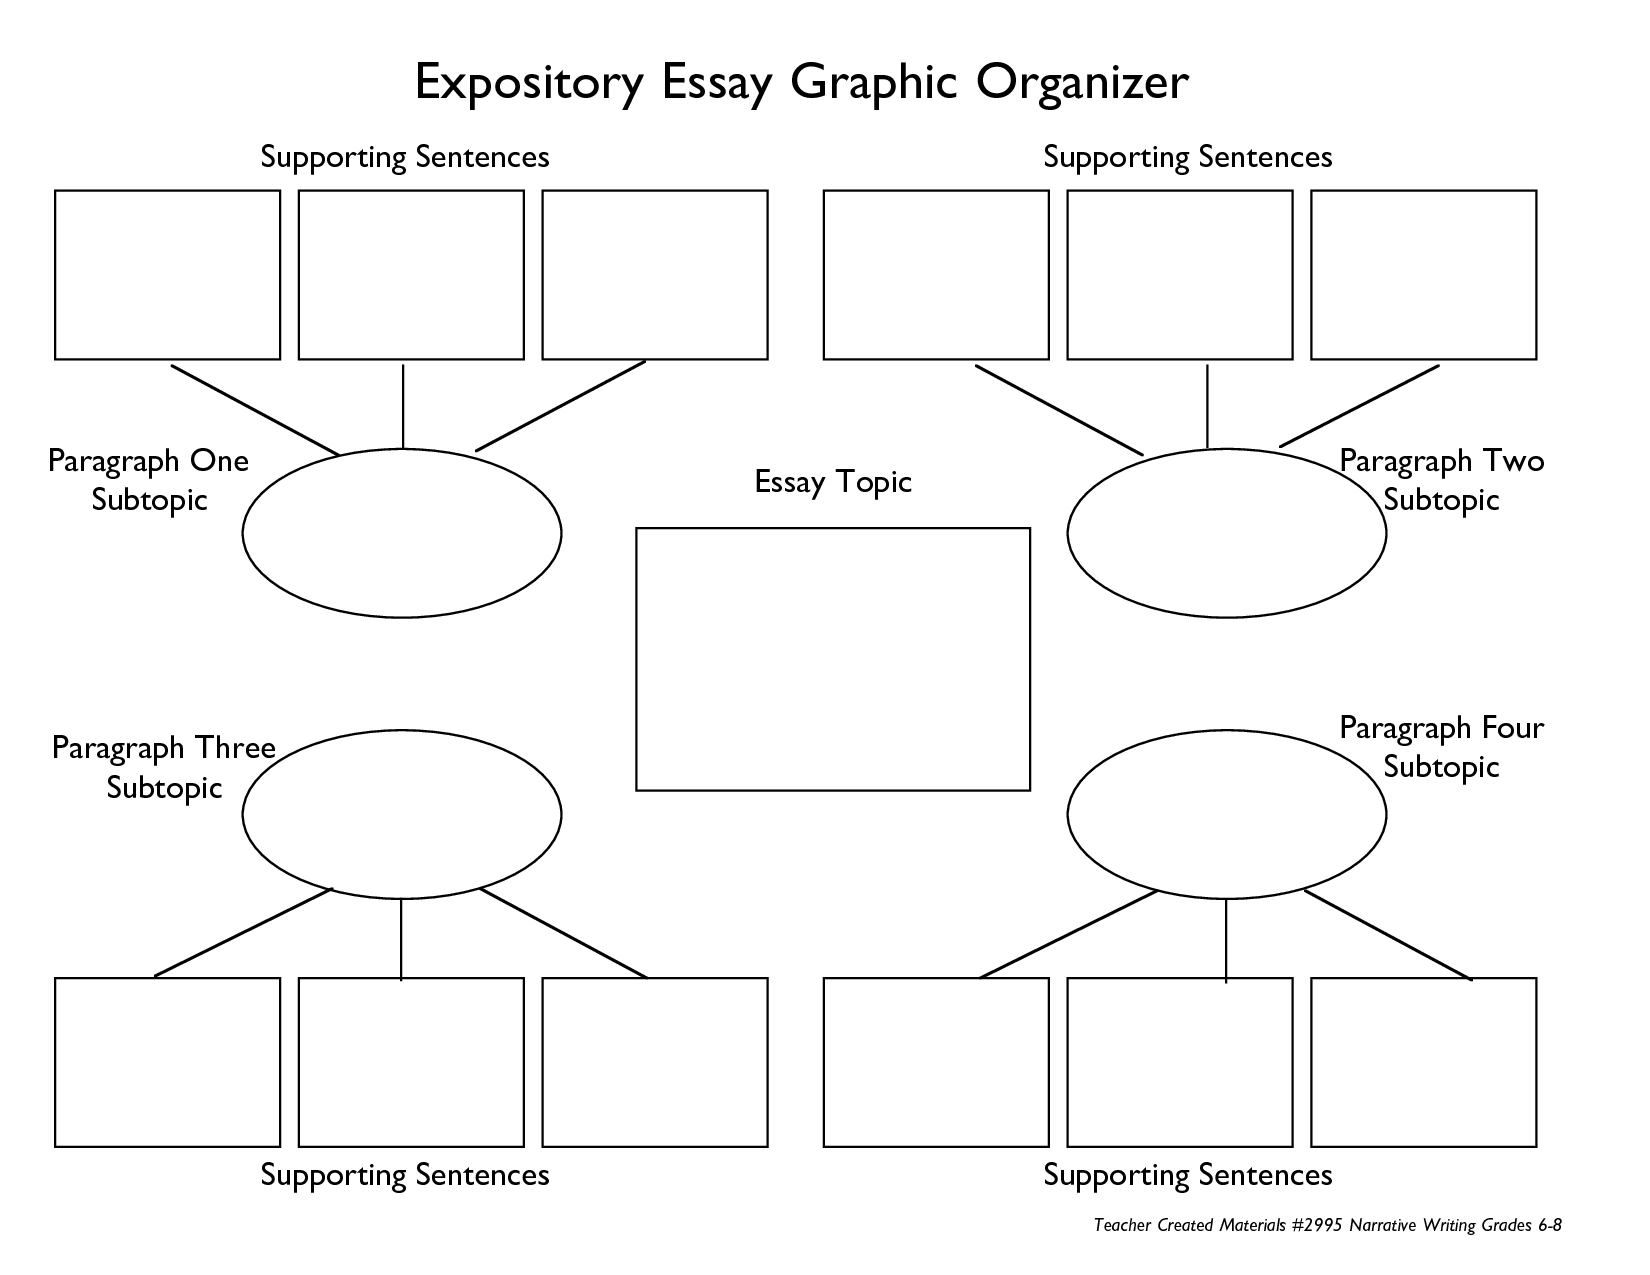 022 College Essay Organizer Surprising Application Graphic Organizers Argumentative Full